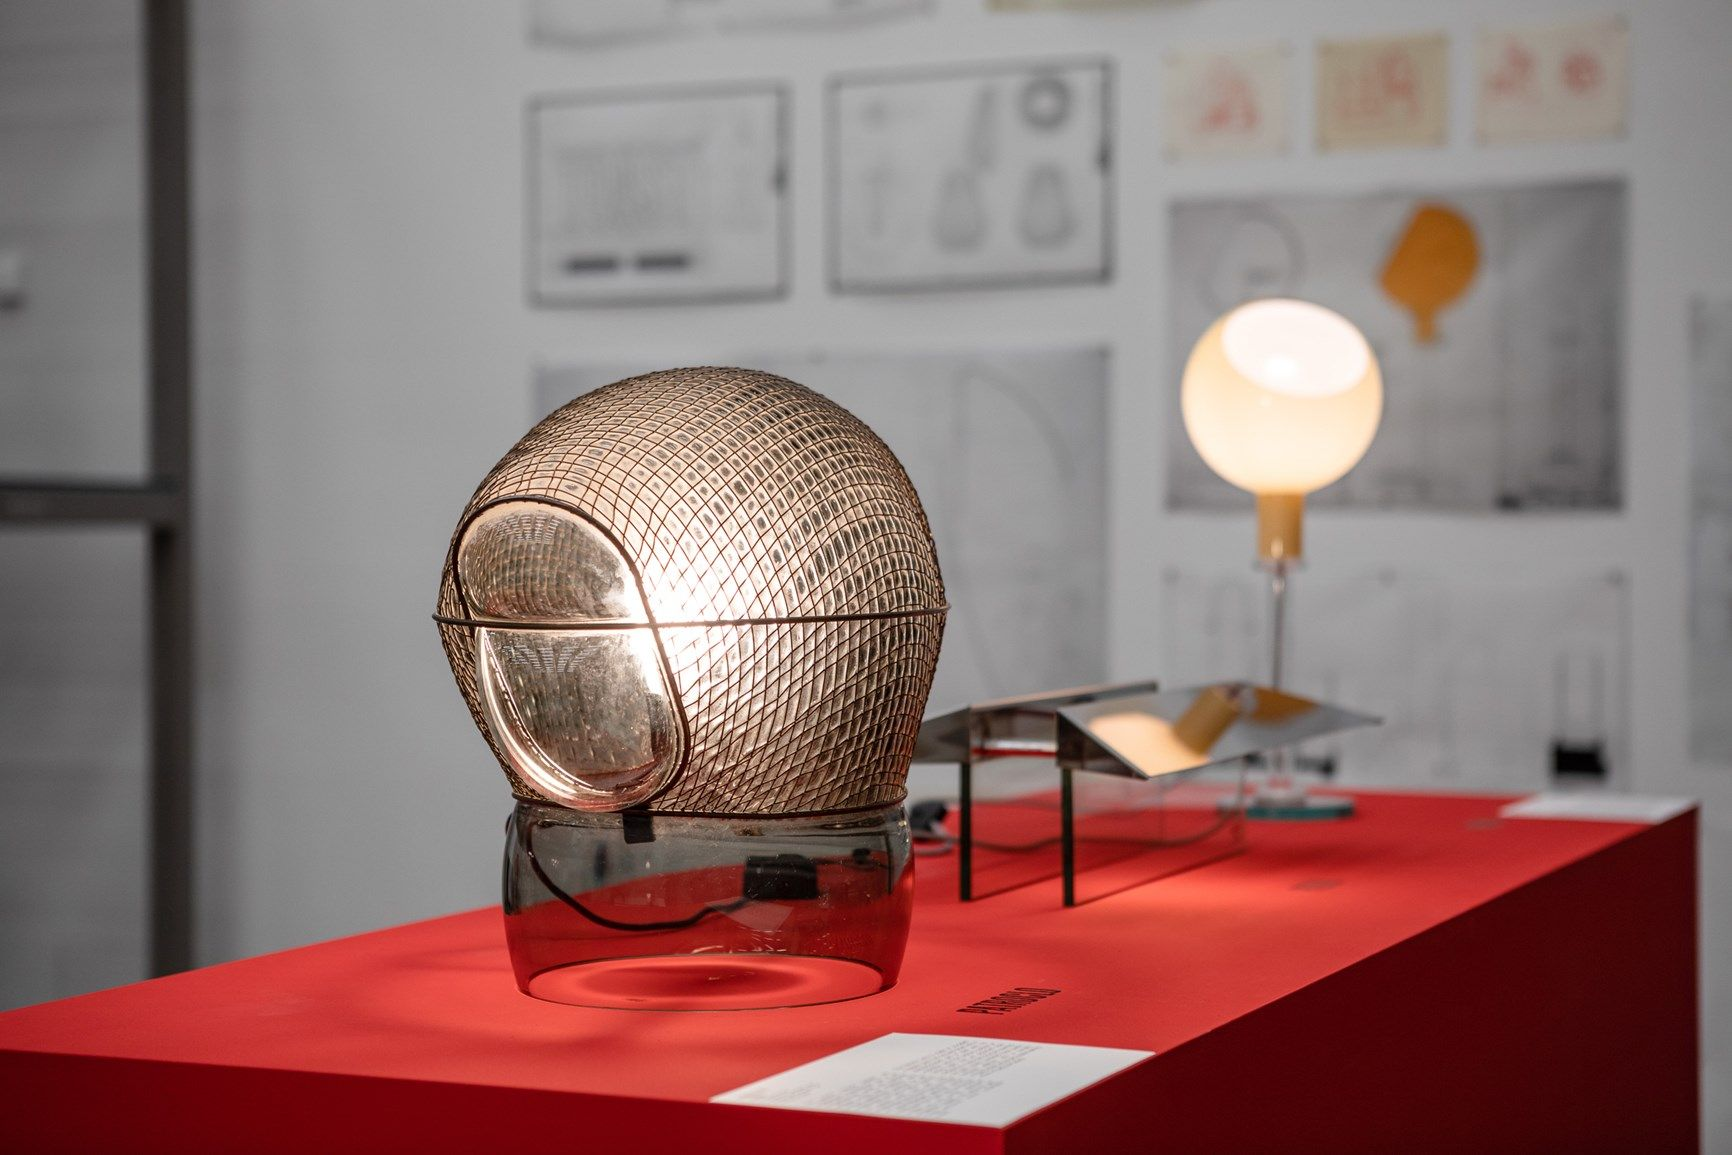 Installation view »Gae Aulenti. A Creative Universe« © Vitra Design Museum, photo: Bettina Matthiessen